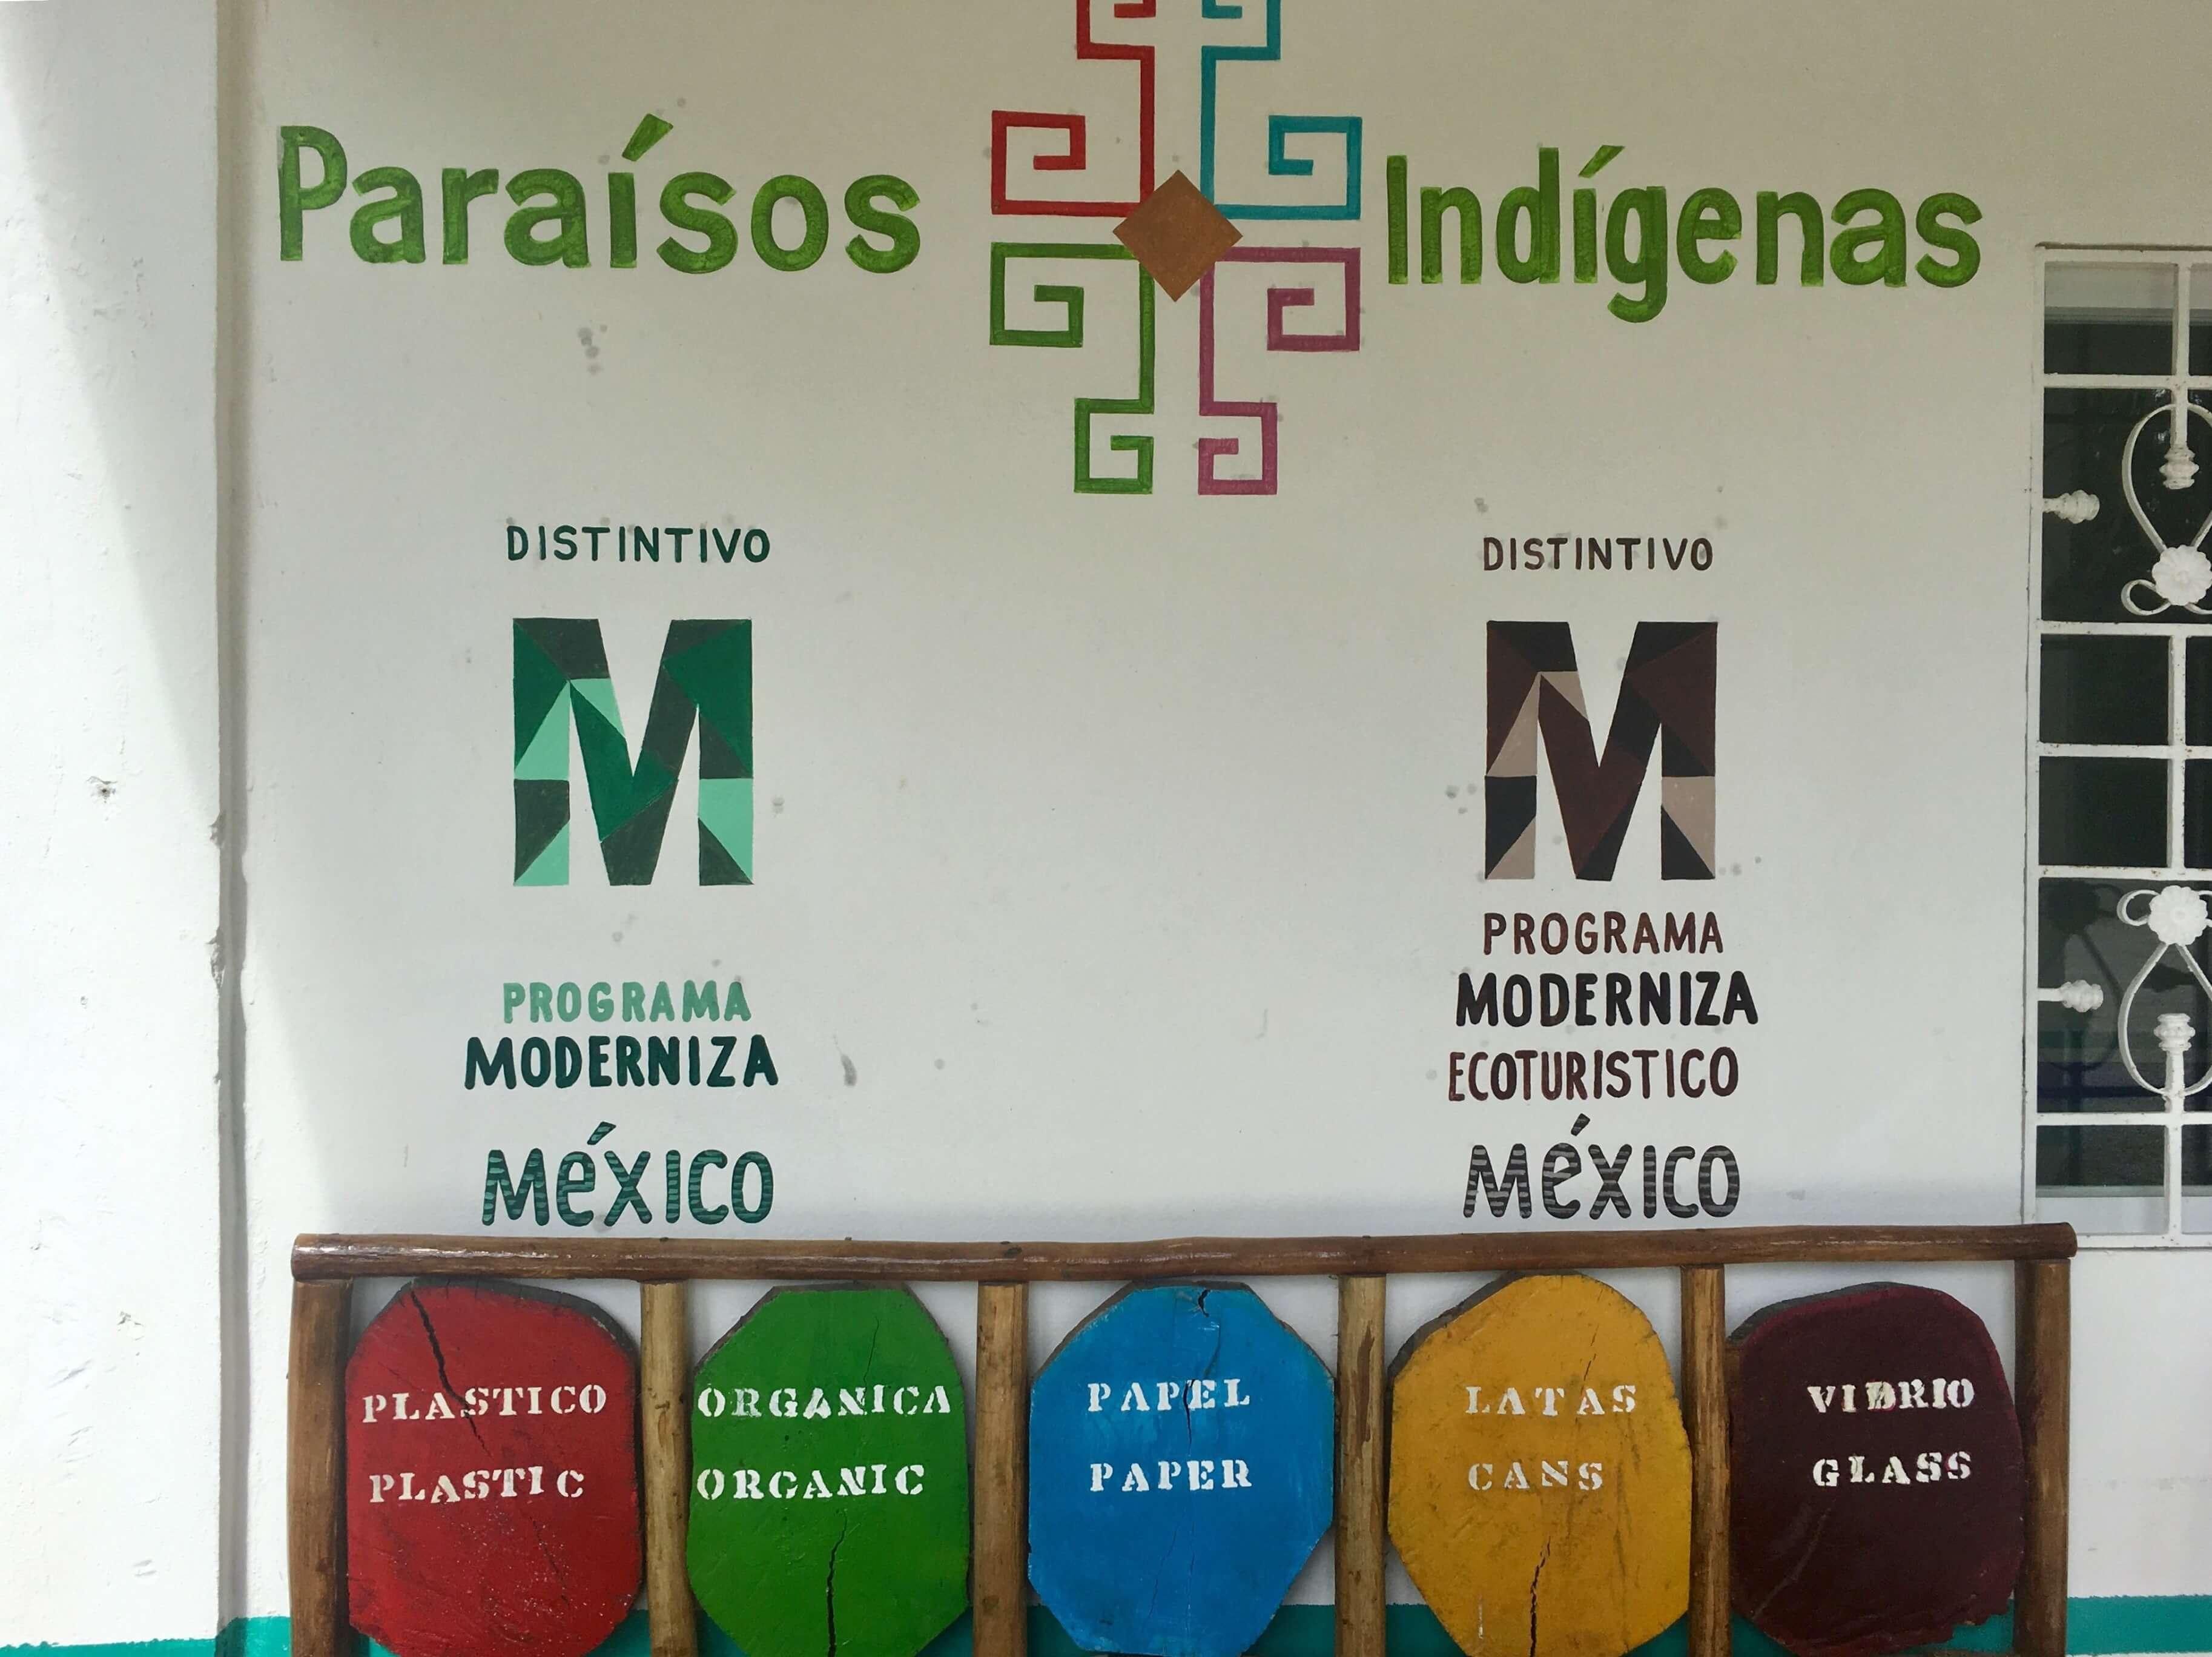 Mexican Caribbean revolutionizes tourism through sustainable initiatives